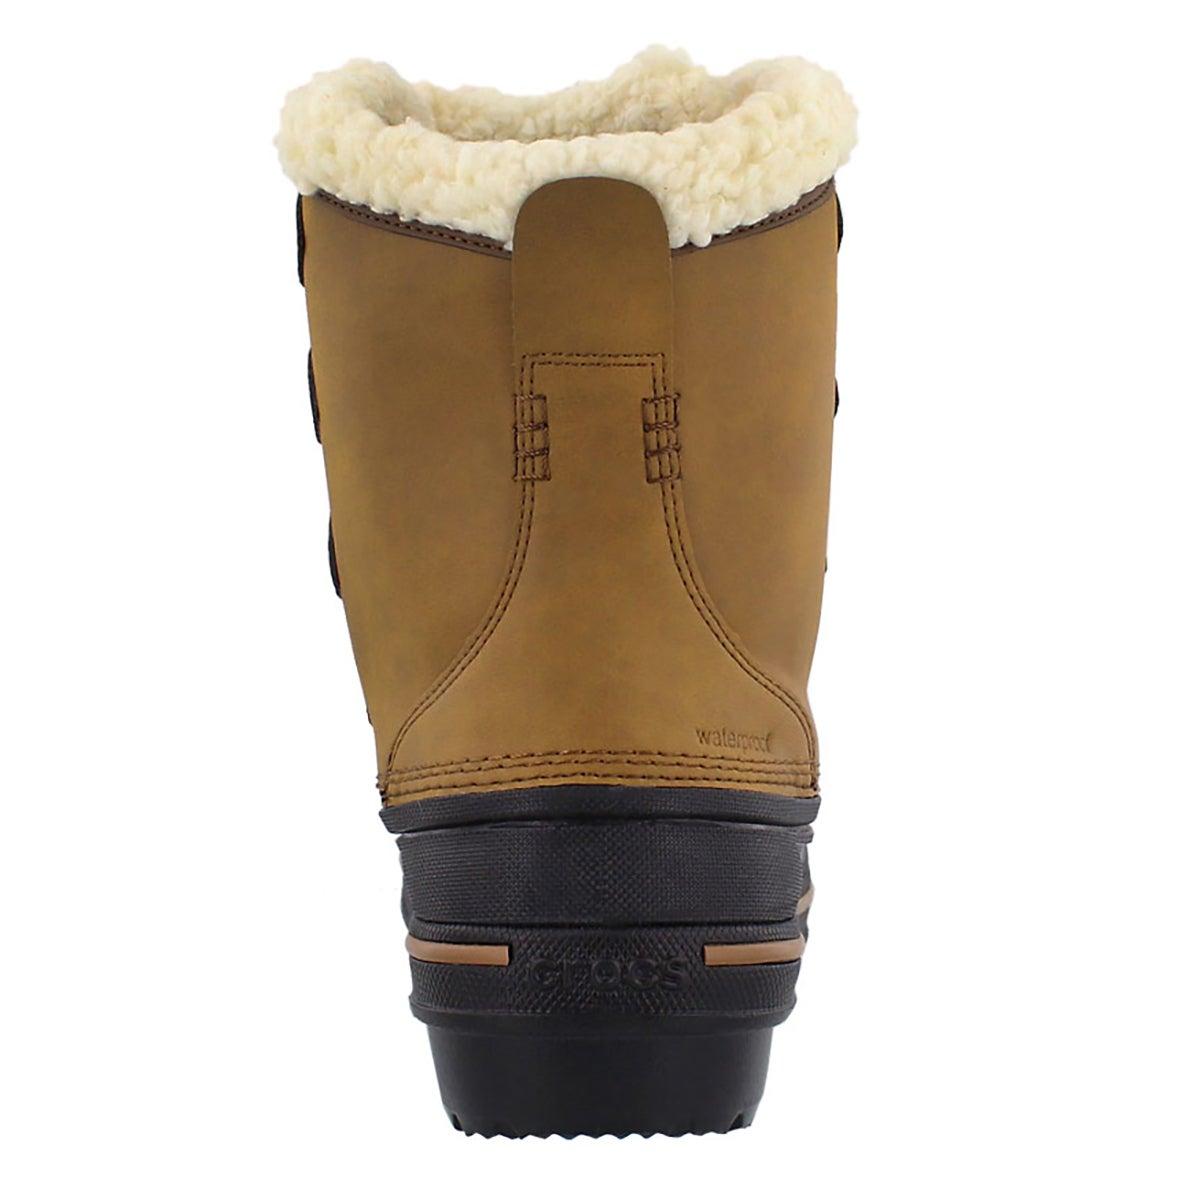 Lds All Cast II wheat winter boot